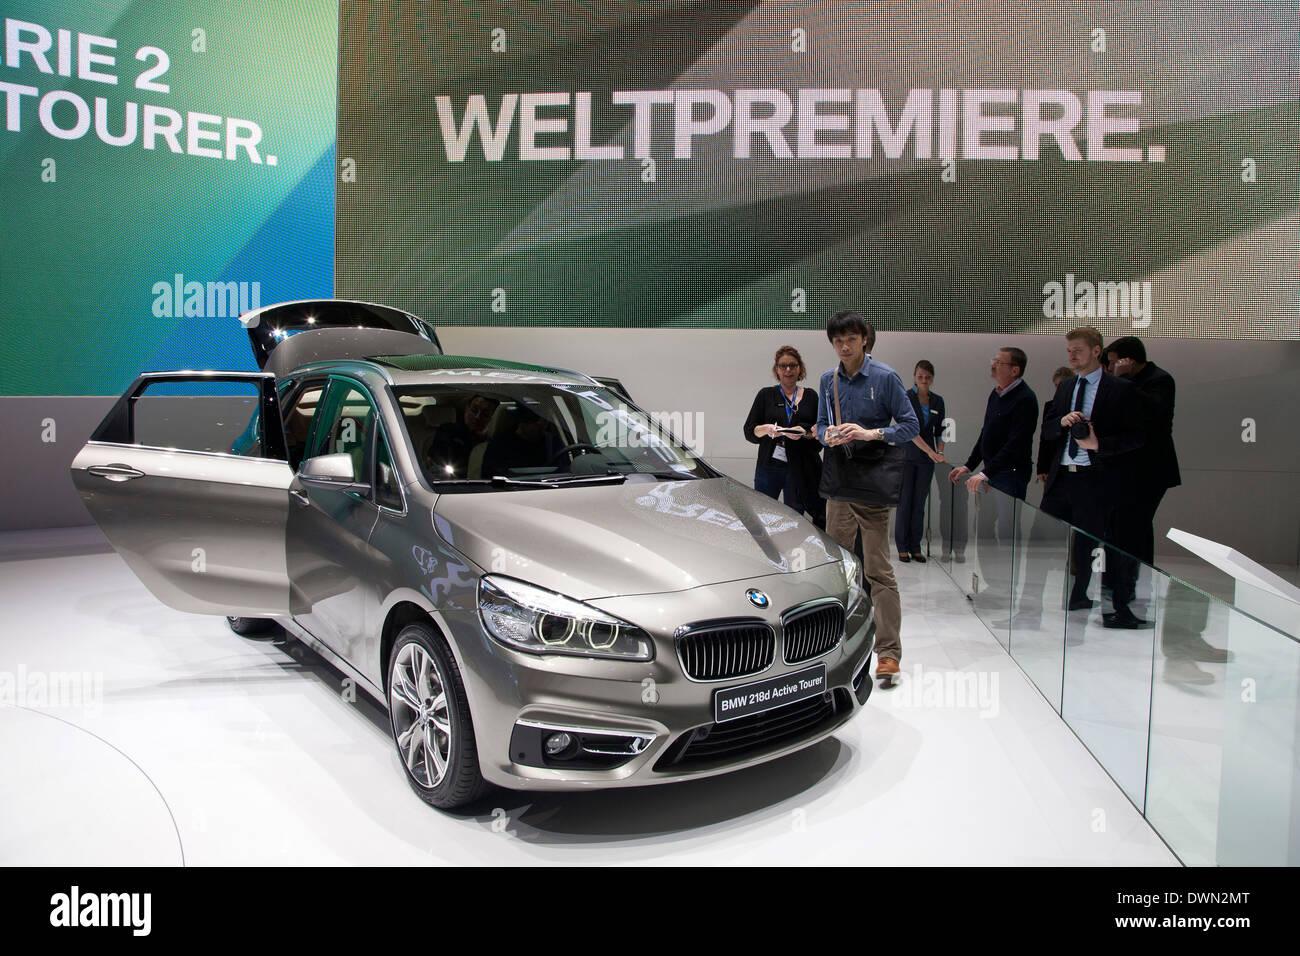 BMW 2-Series Active Tourer minivan en el 84º Salón Internacional del Automóvil de Ginebra 2014. Imagen De Stock